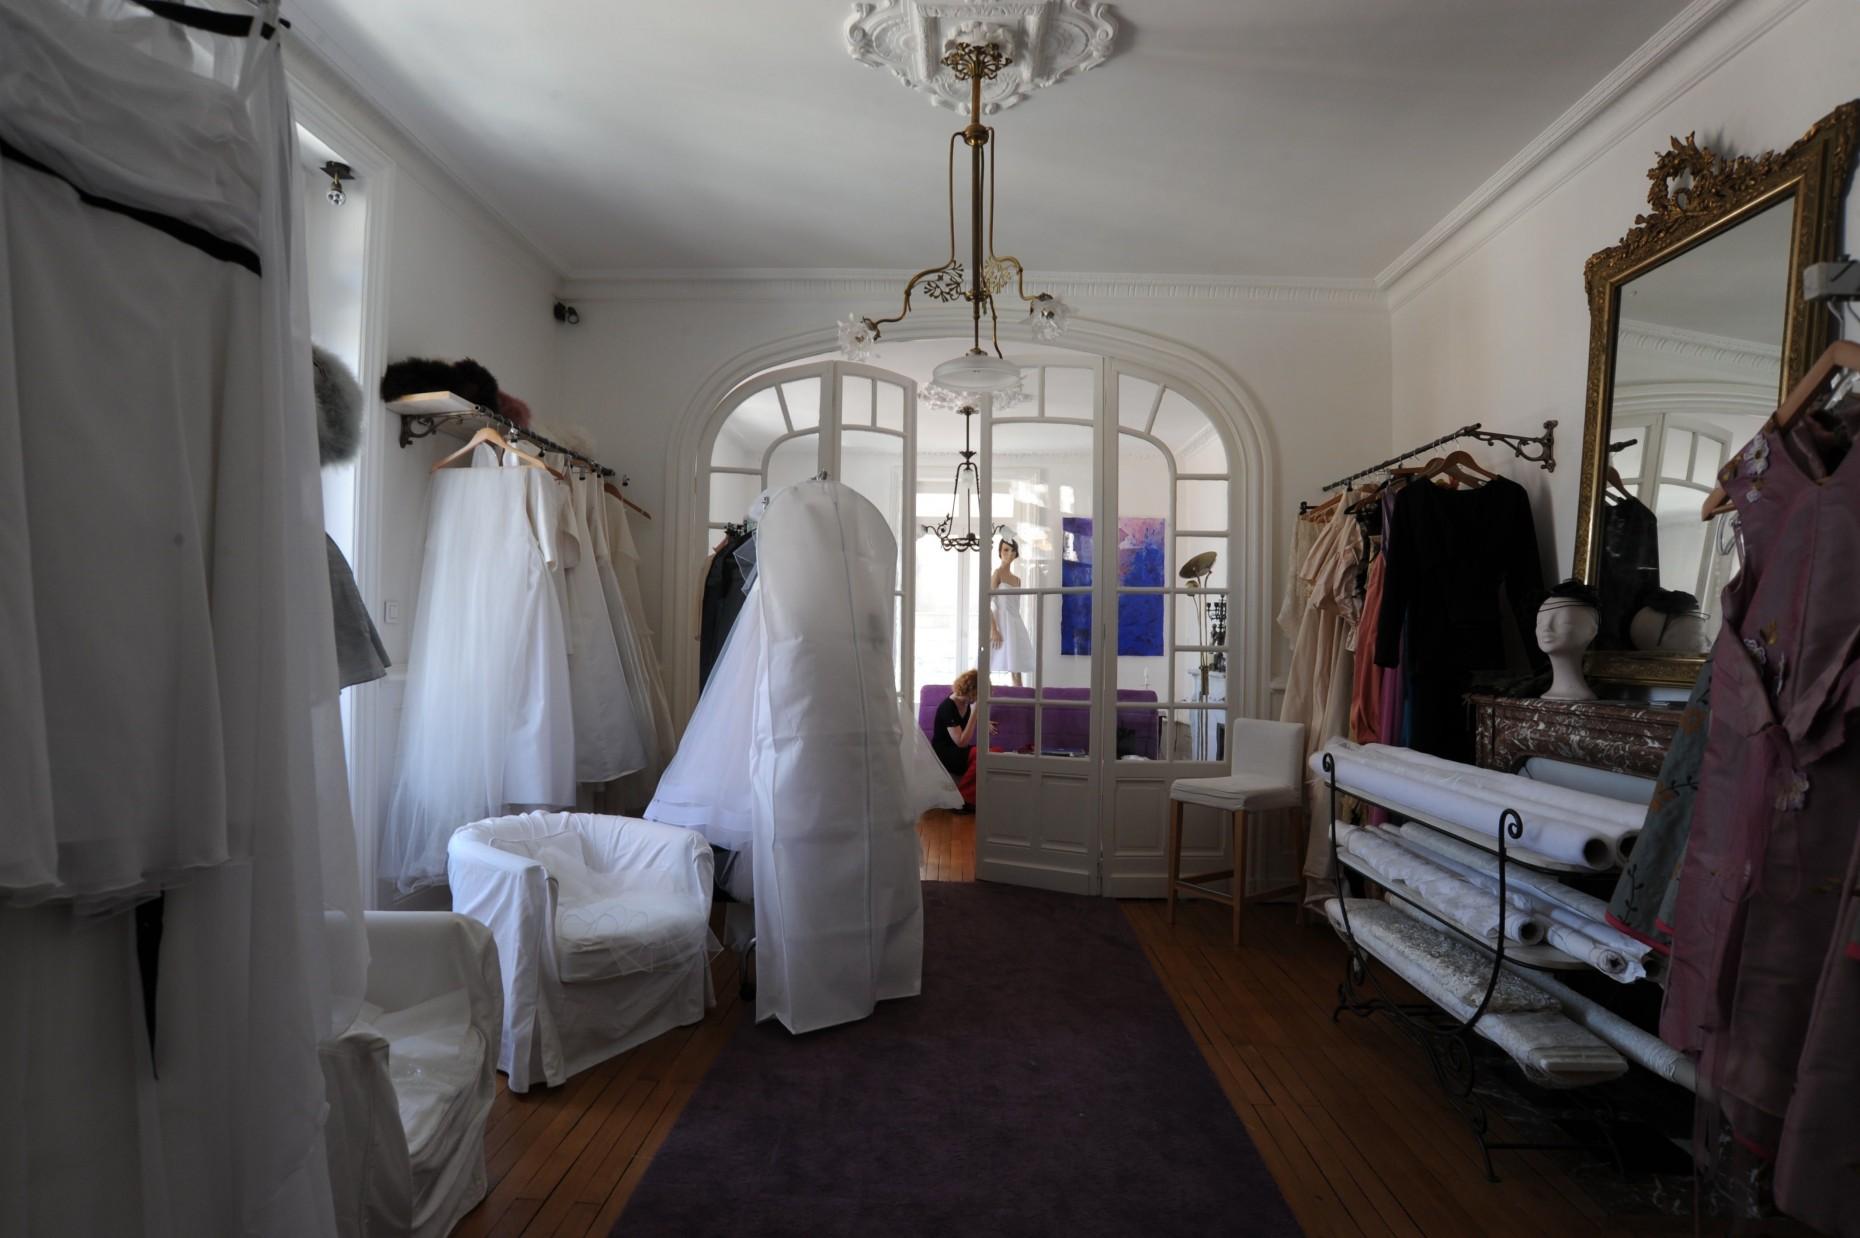 Le show-room